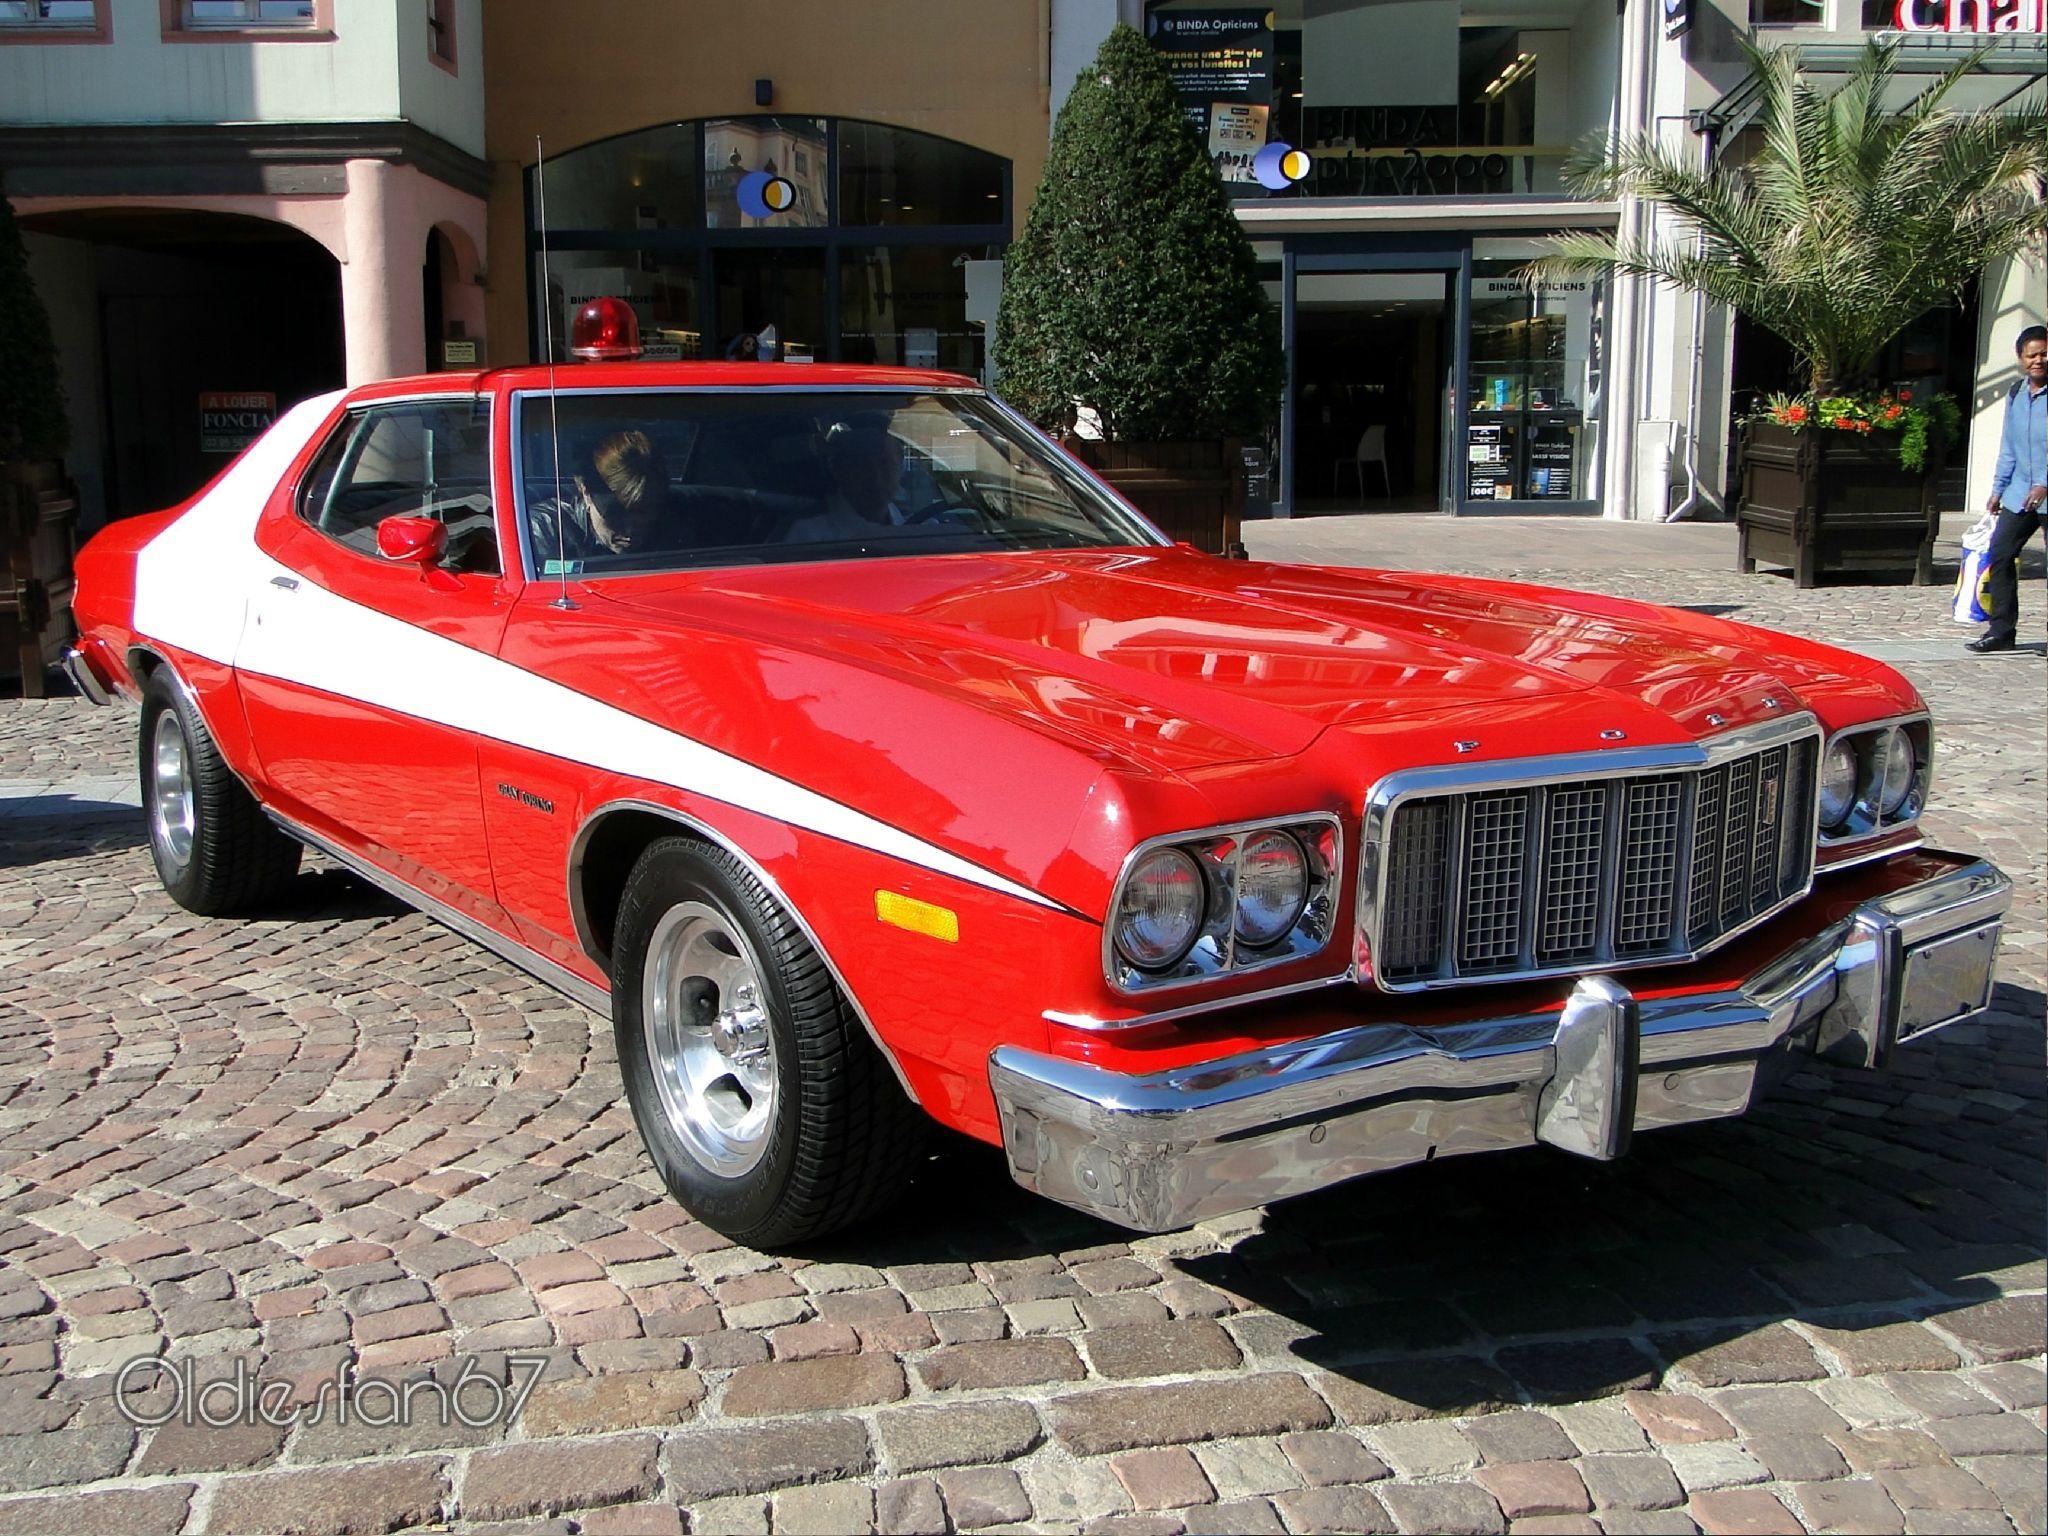 ford gran torino 1976 starsky hutch automobiles pinterest voitures voitures et motos. Black Bedroom Furniture Sets. Home Design Ideas